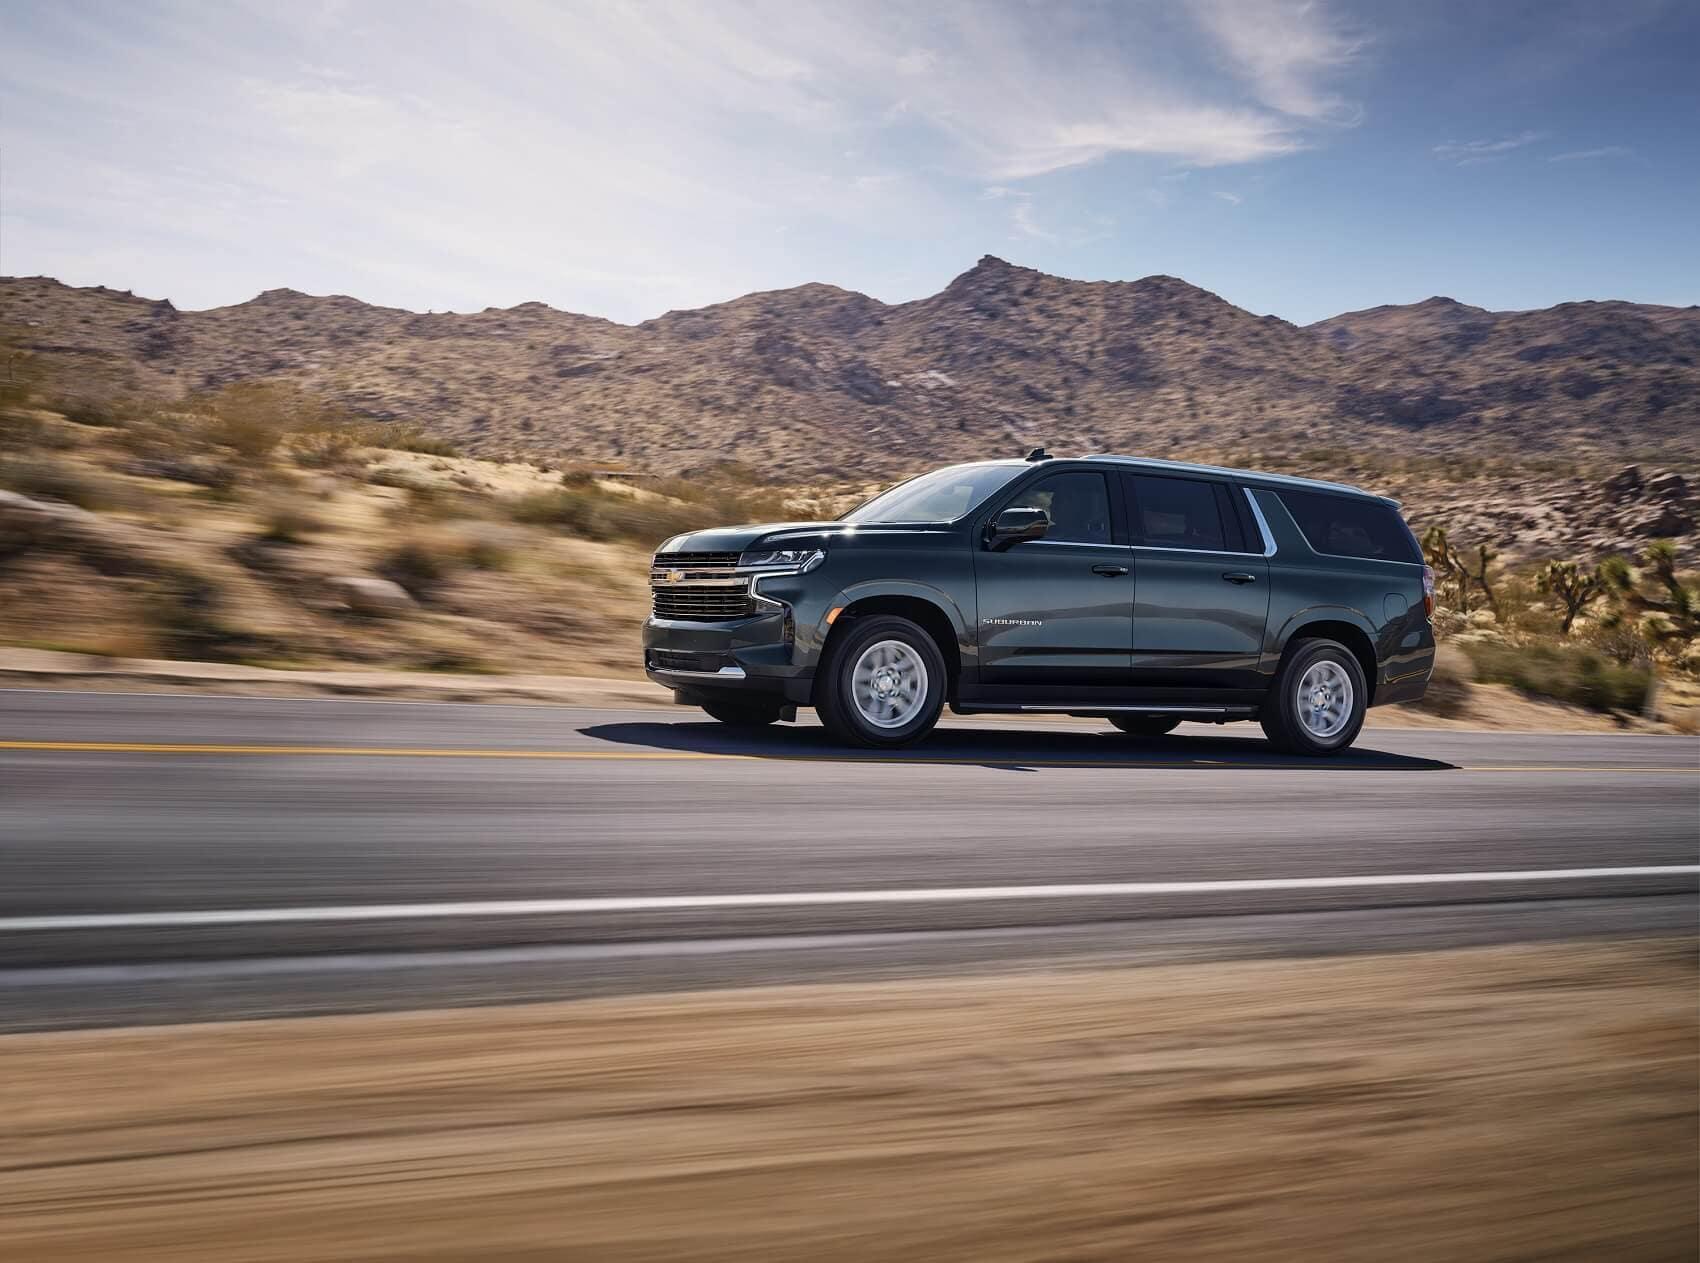 CHEVY CARS, TRUCKS, AND SUVS